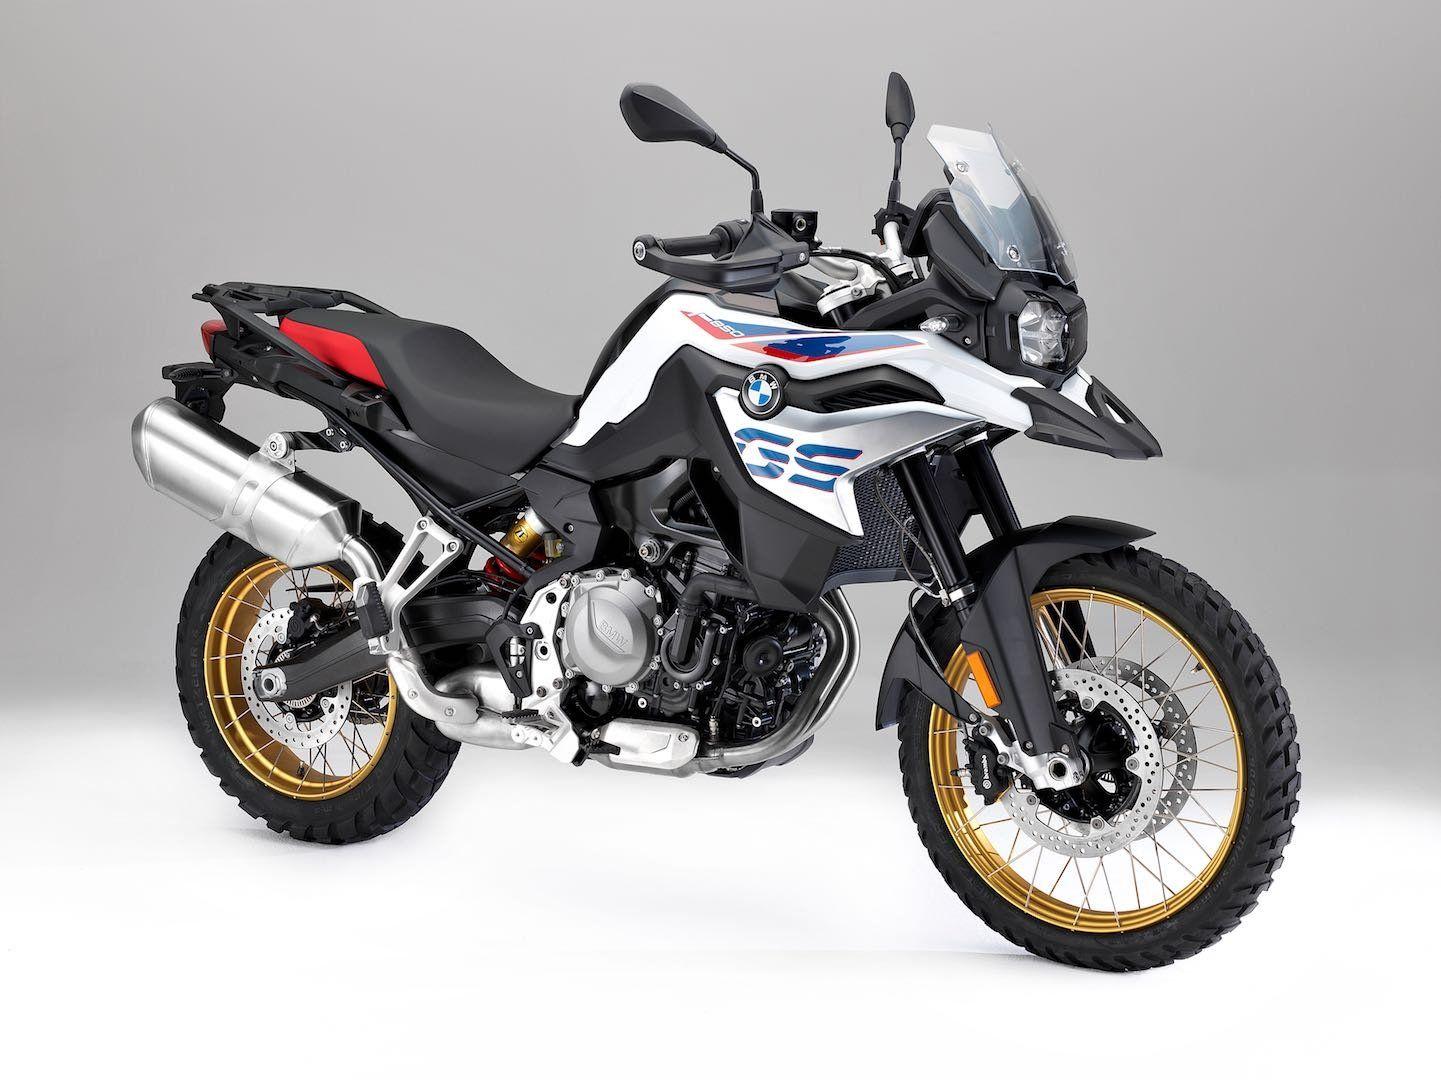 Bmw 650 Gs 2018 Precio Engine From 2018 Bmw F 850 Gs And F 750 Gs First Looks 12 Fast Facts Throug Bmw Adventure Bike Adventure Bike Motorcycles Bmw Motorrad